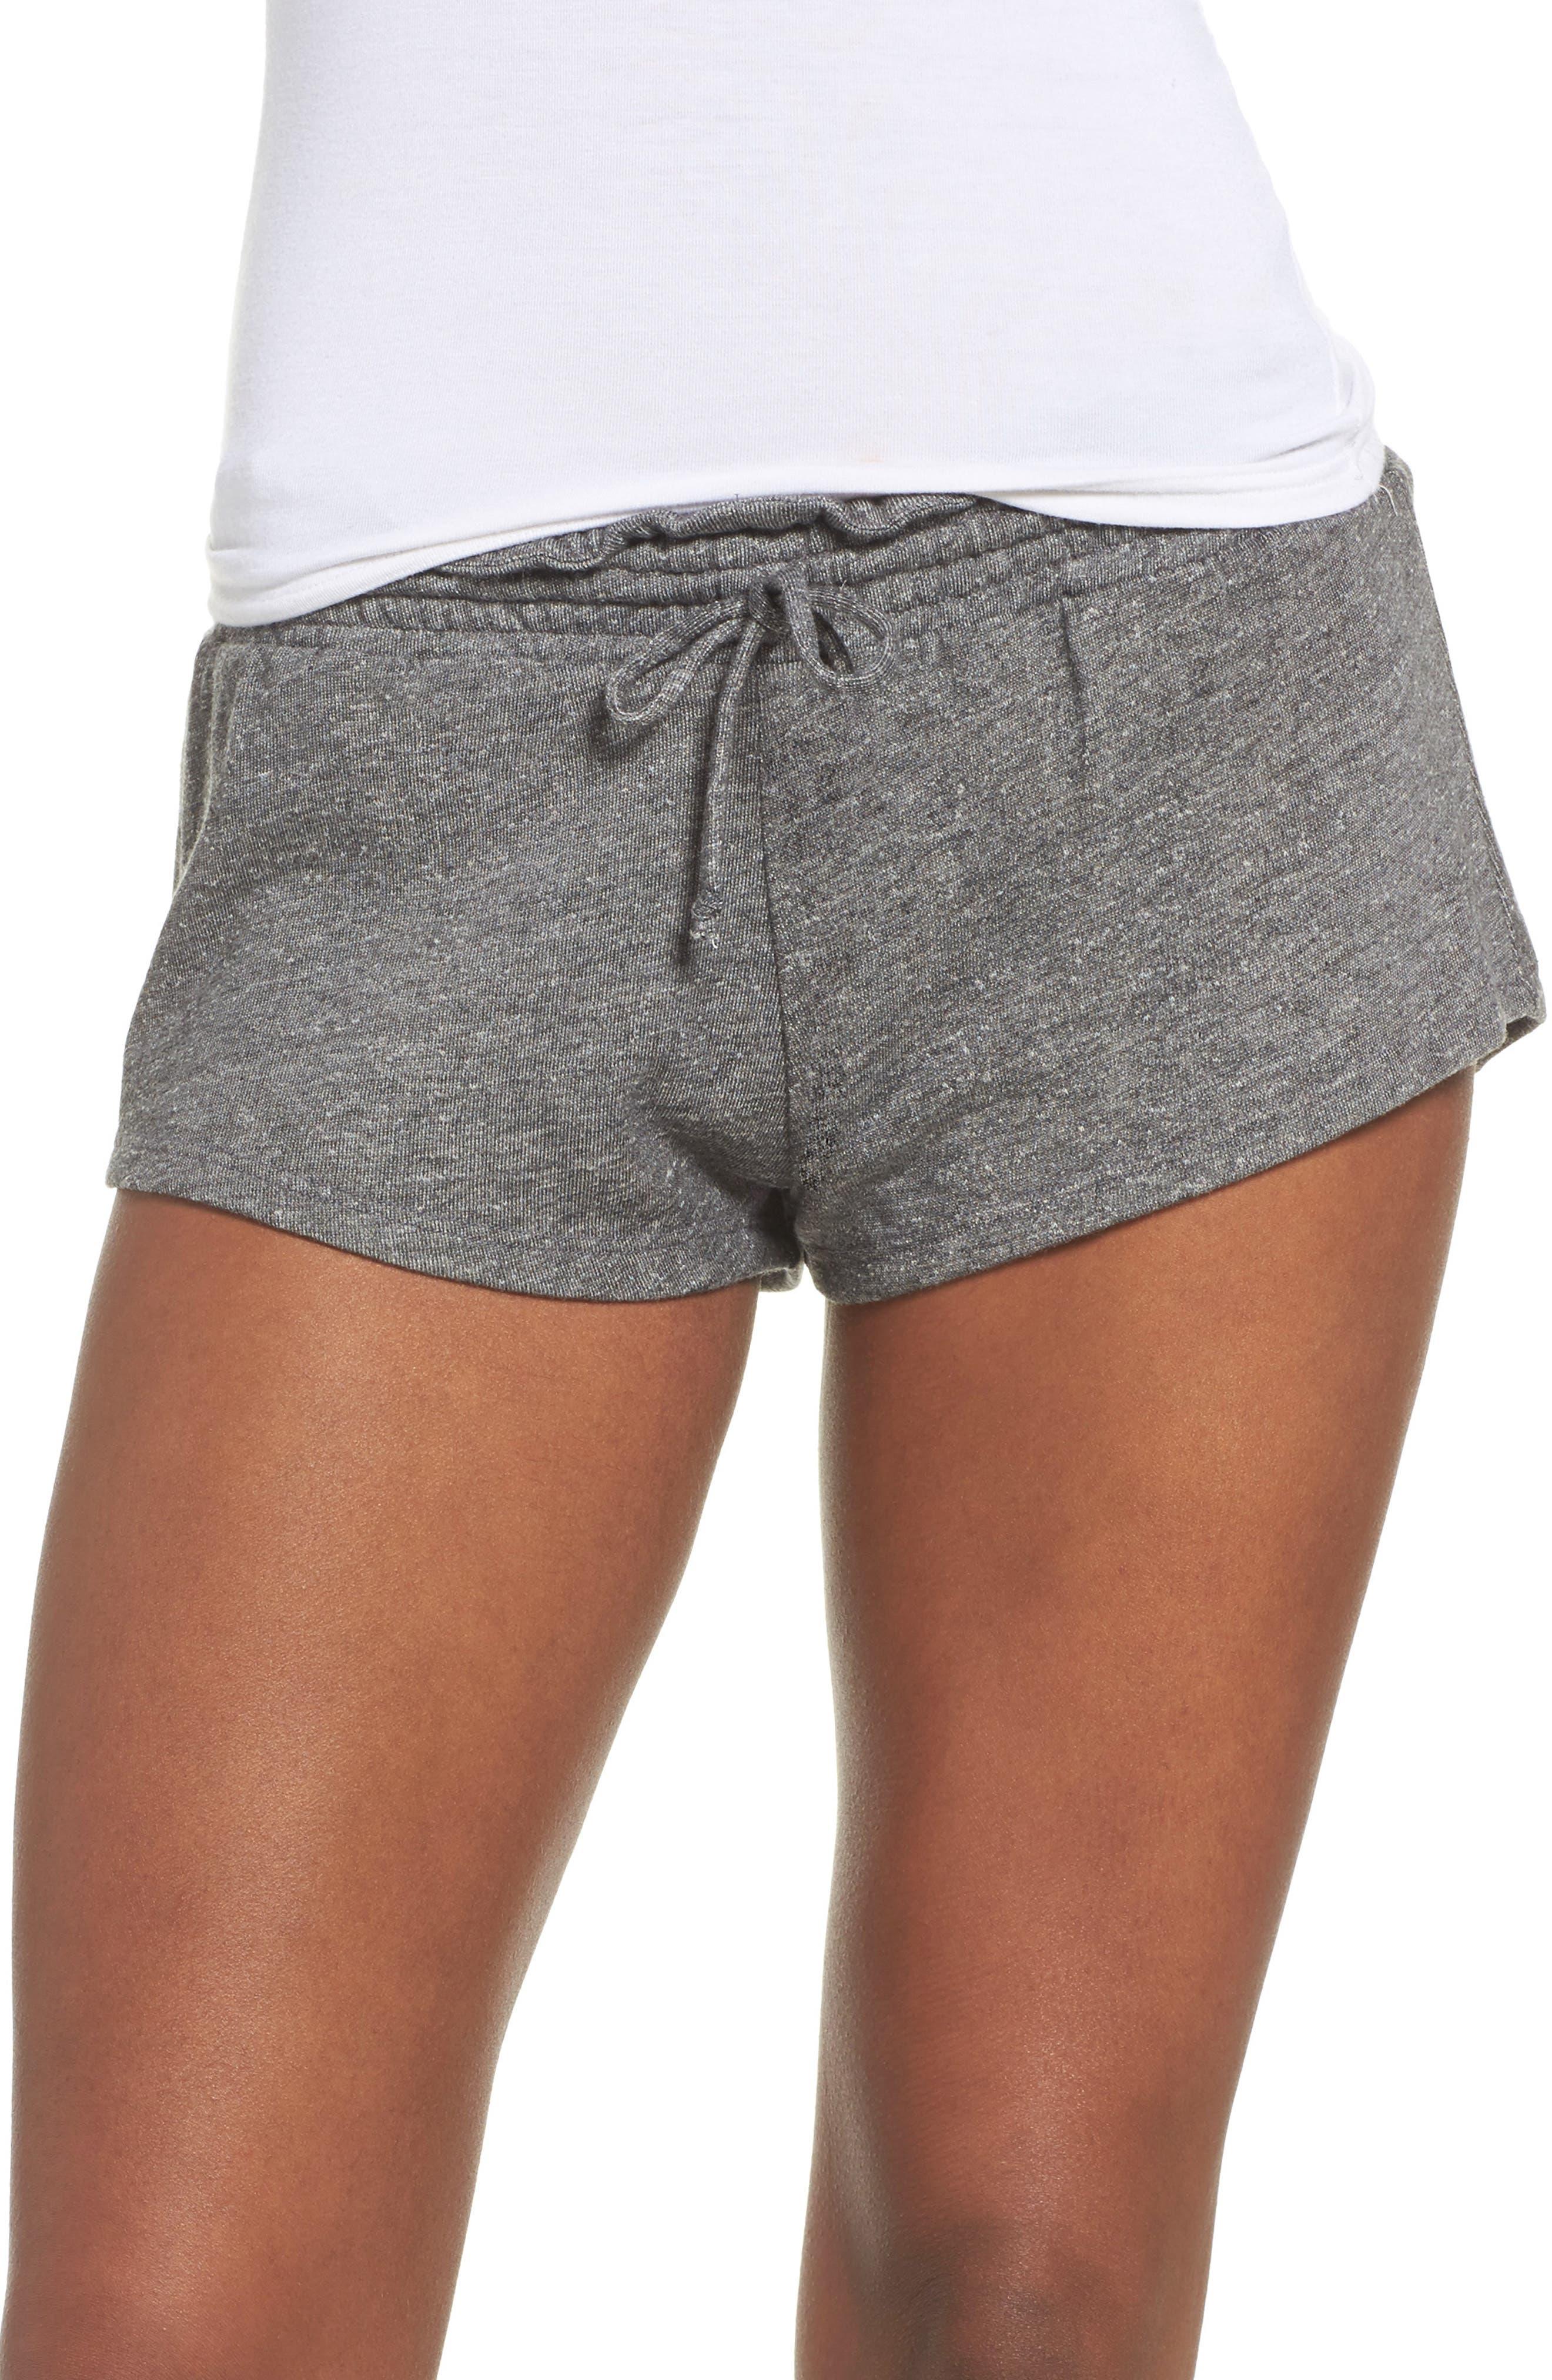 Alternate Image 1 Selected - Olympia Theodora Dallas Shorts